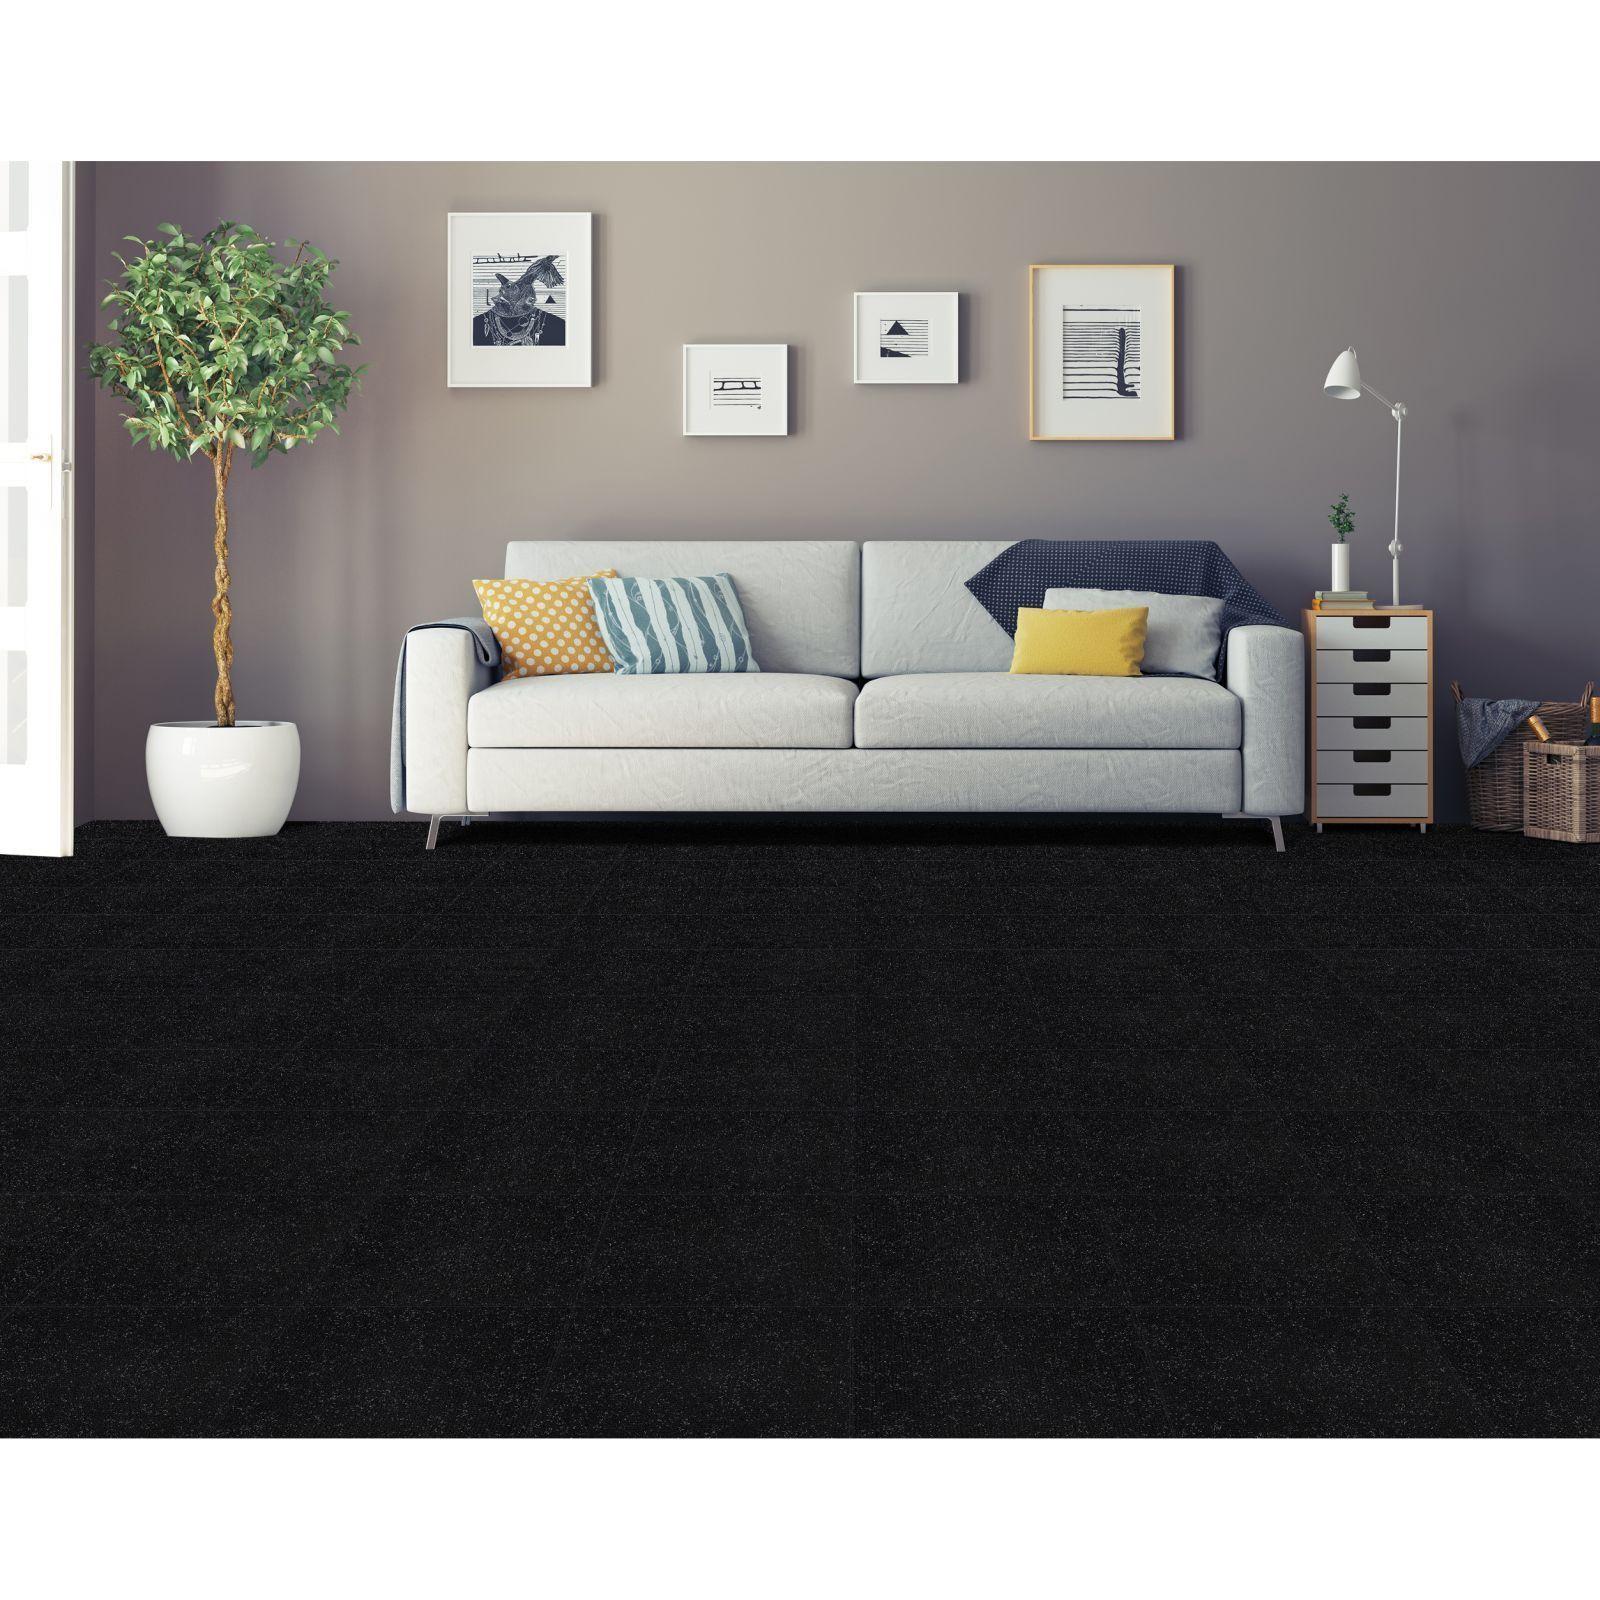 Achim Nexus Jet Self Adhesive Carpet Floor Tile (12 Tiles) (12x12 ...